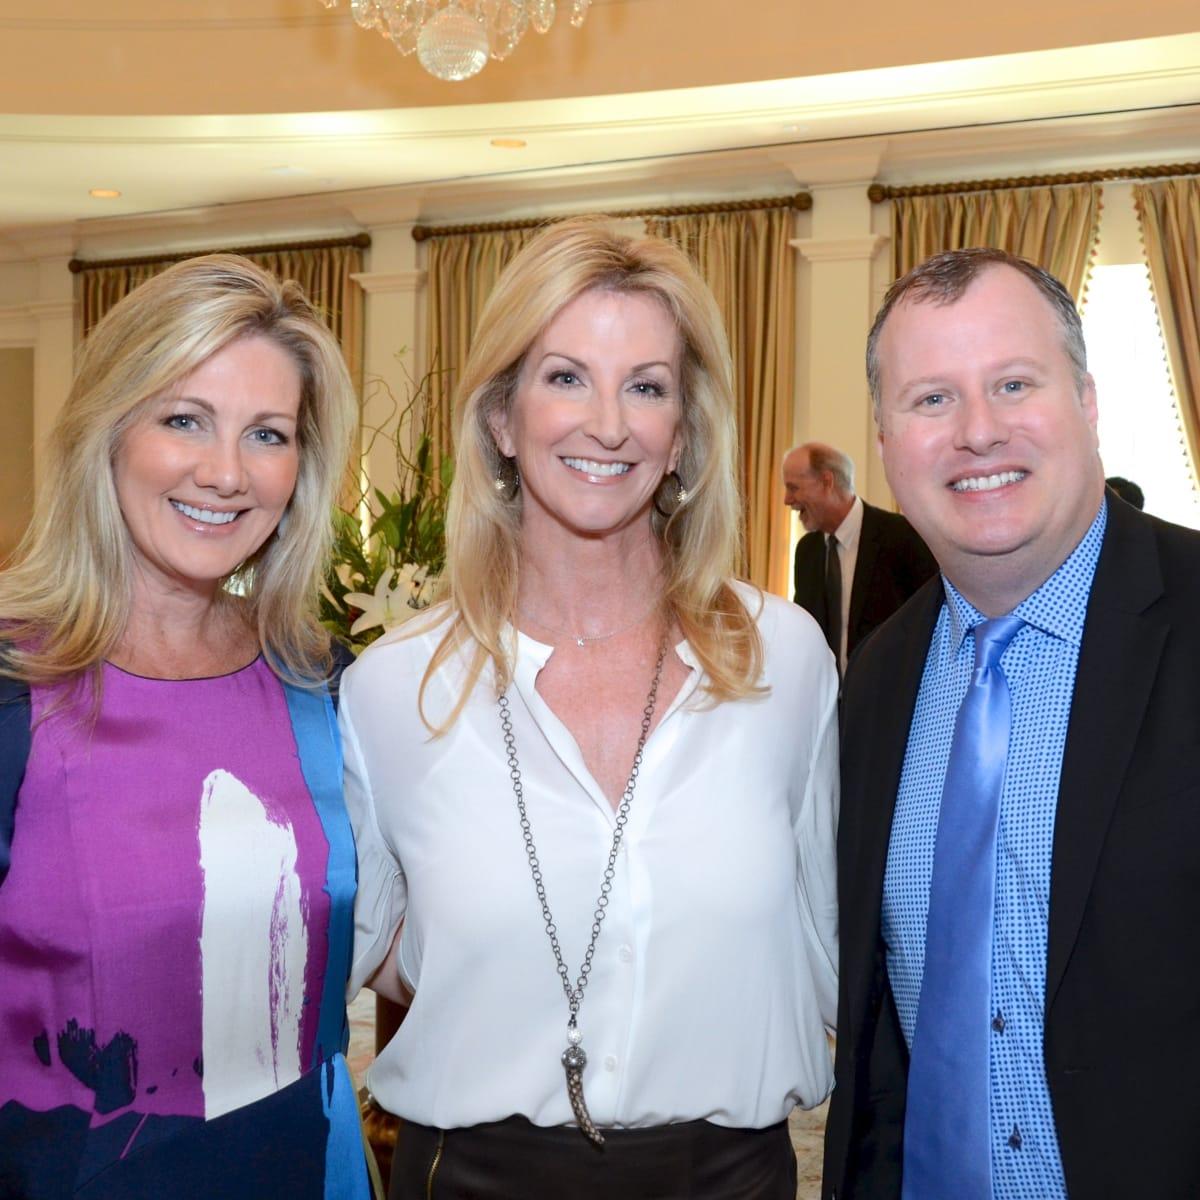 PDAP event Sept 2015 Anne Carl, Kim Moody, Michael Carroll